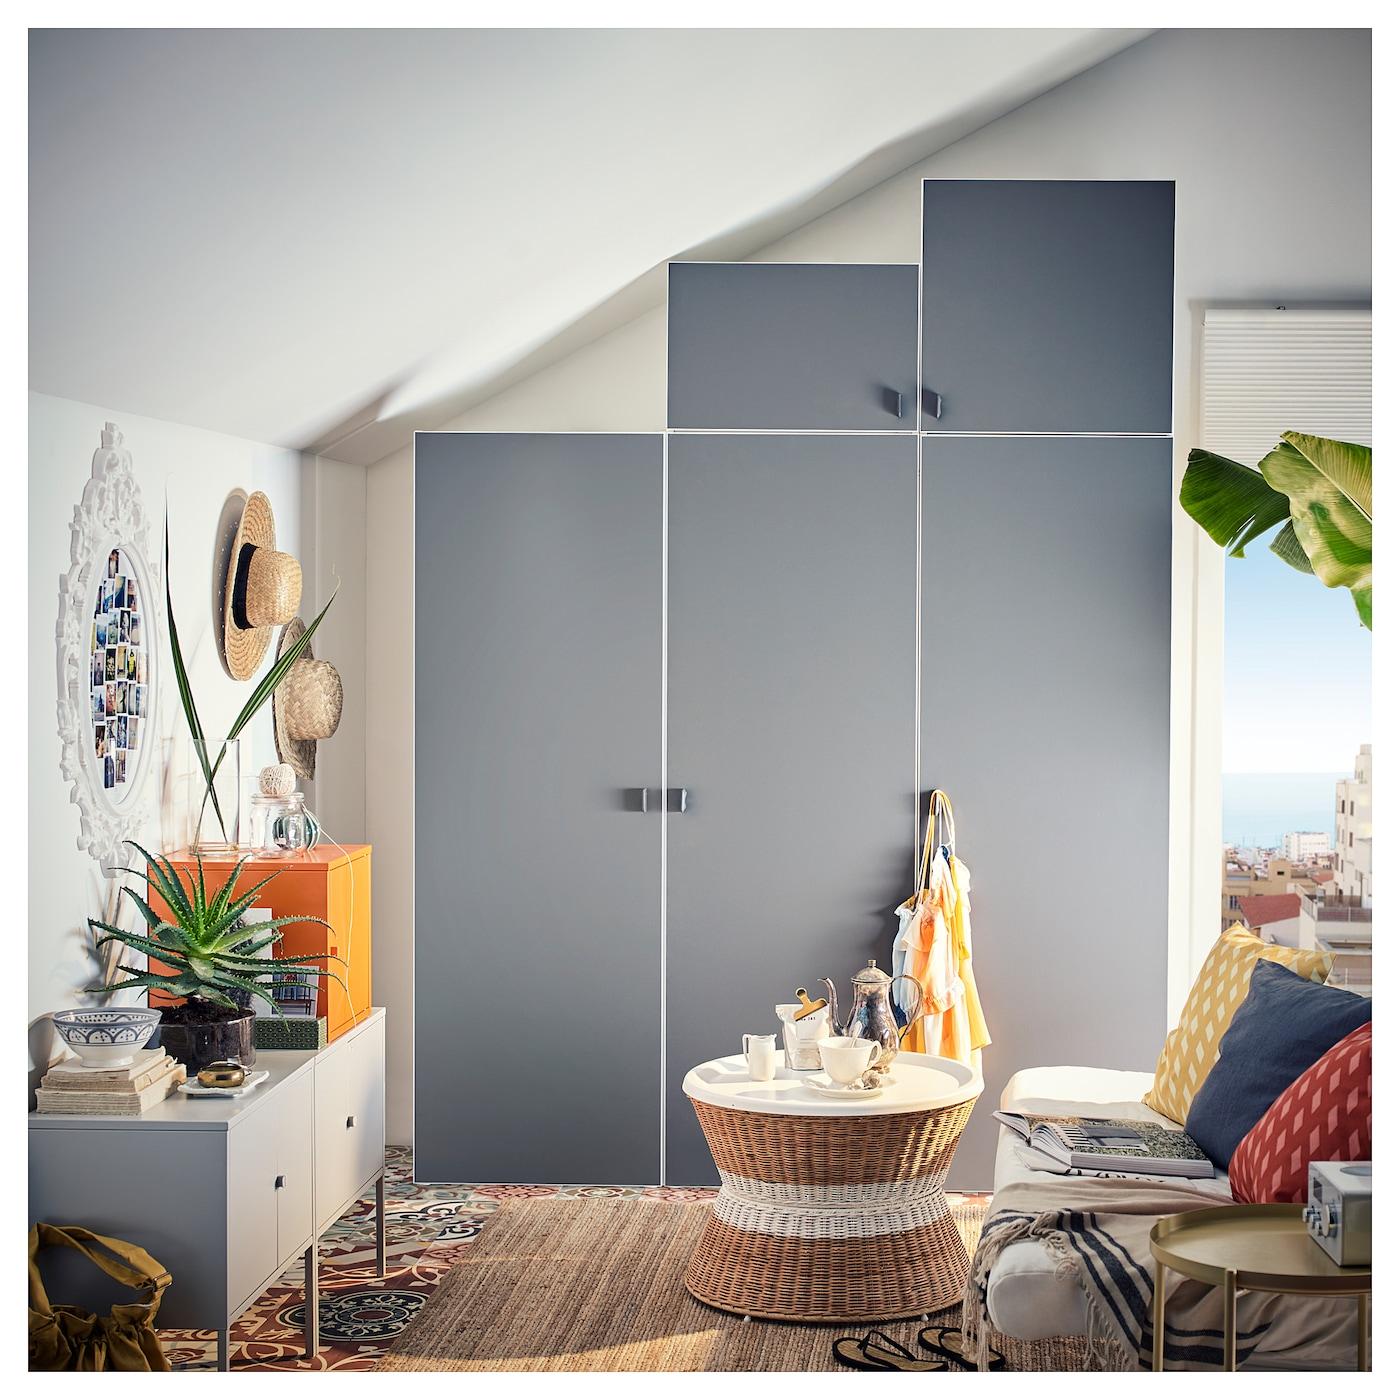 platsa kledingkast wit skatval donkergrijs 180 x 57 x 241 cm ikea. Black Bedroom Furniture Sets. Home Design Ideas